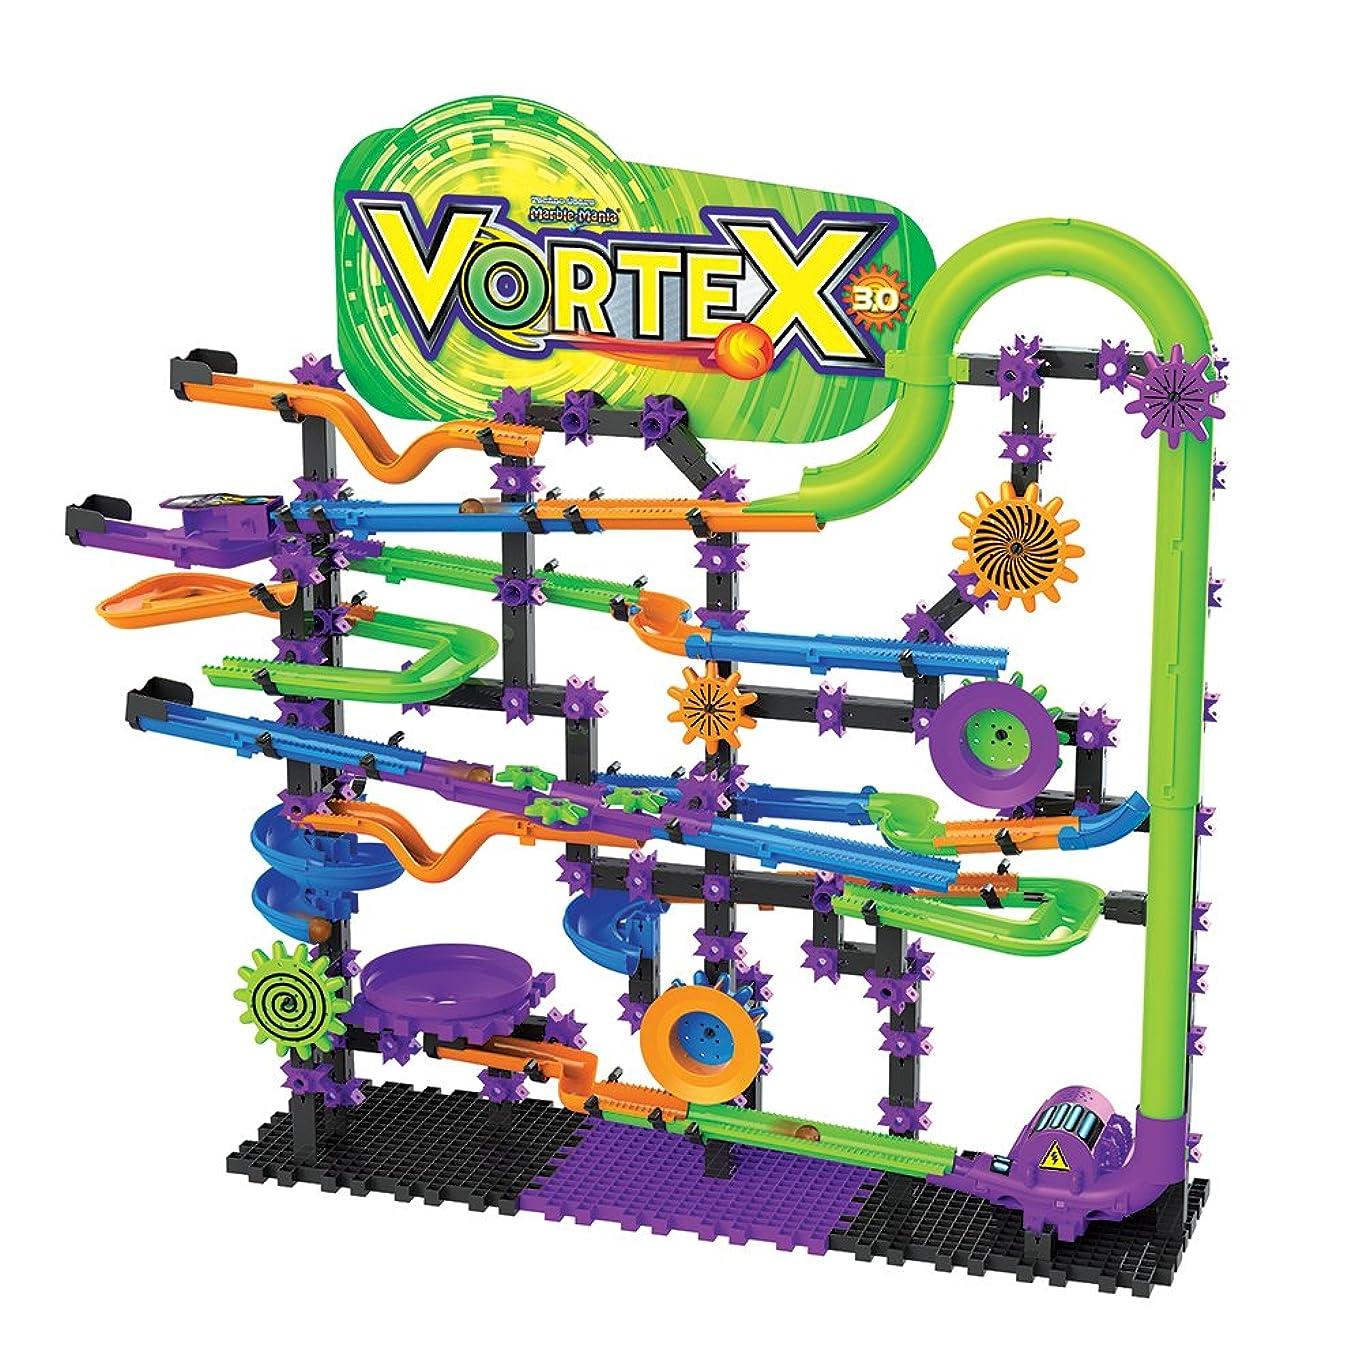 Techno Gears Marble Mania Vortex 3.0  (300+ pcs)